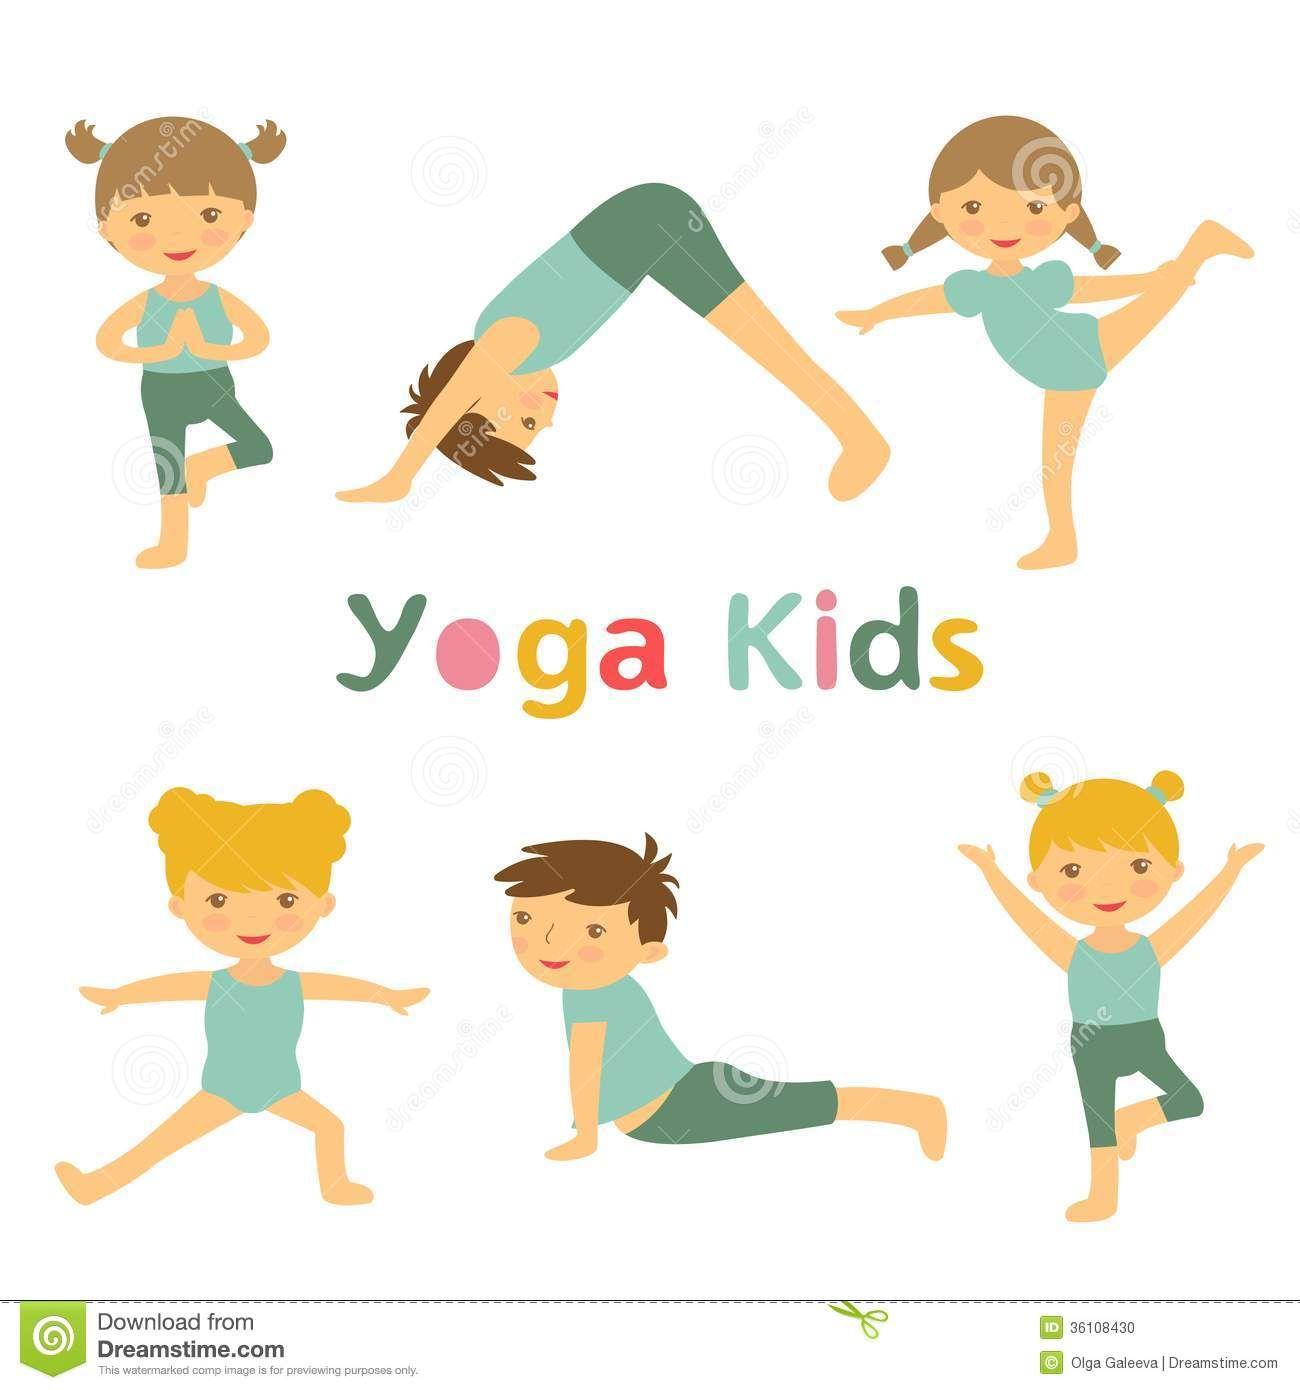 Kids Yoga Clipart Kids yoga clipart yoga kids.